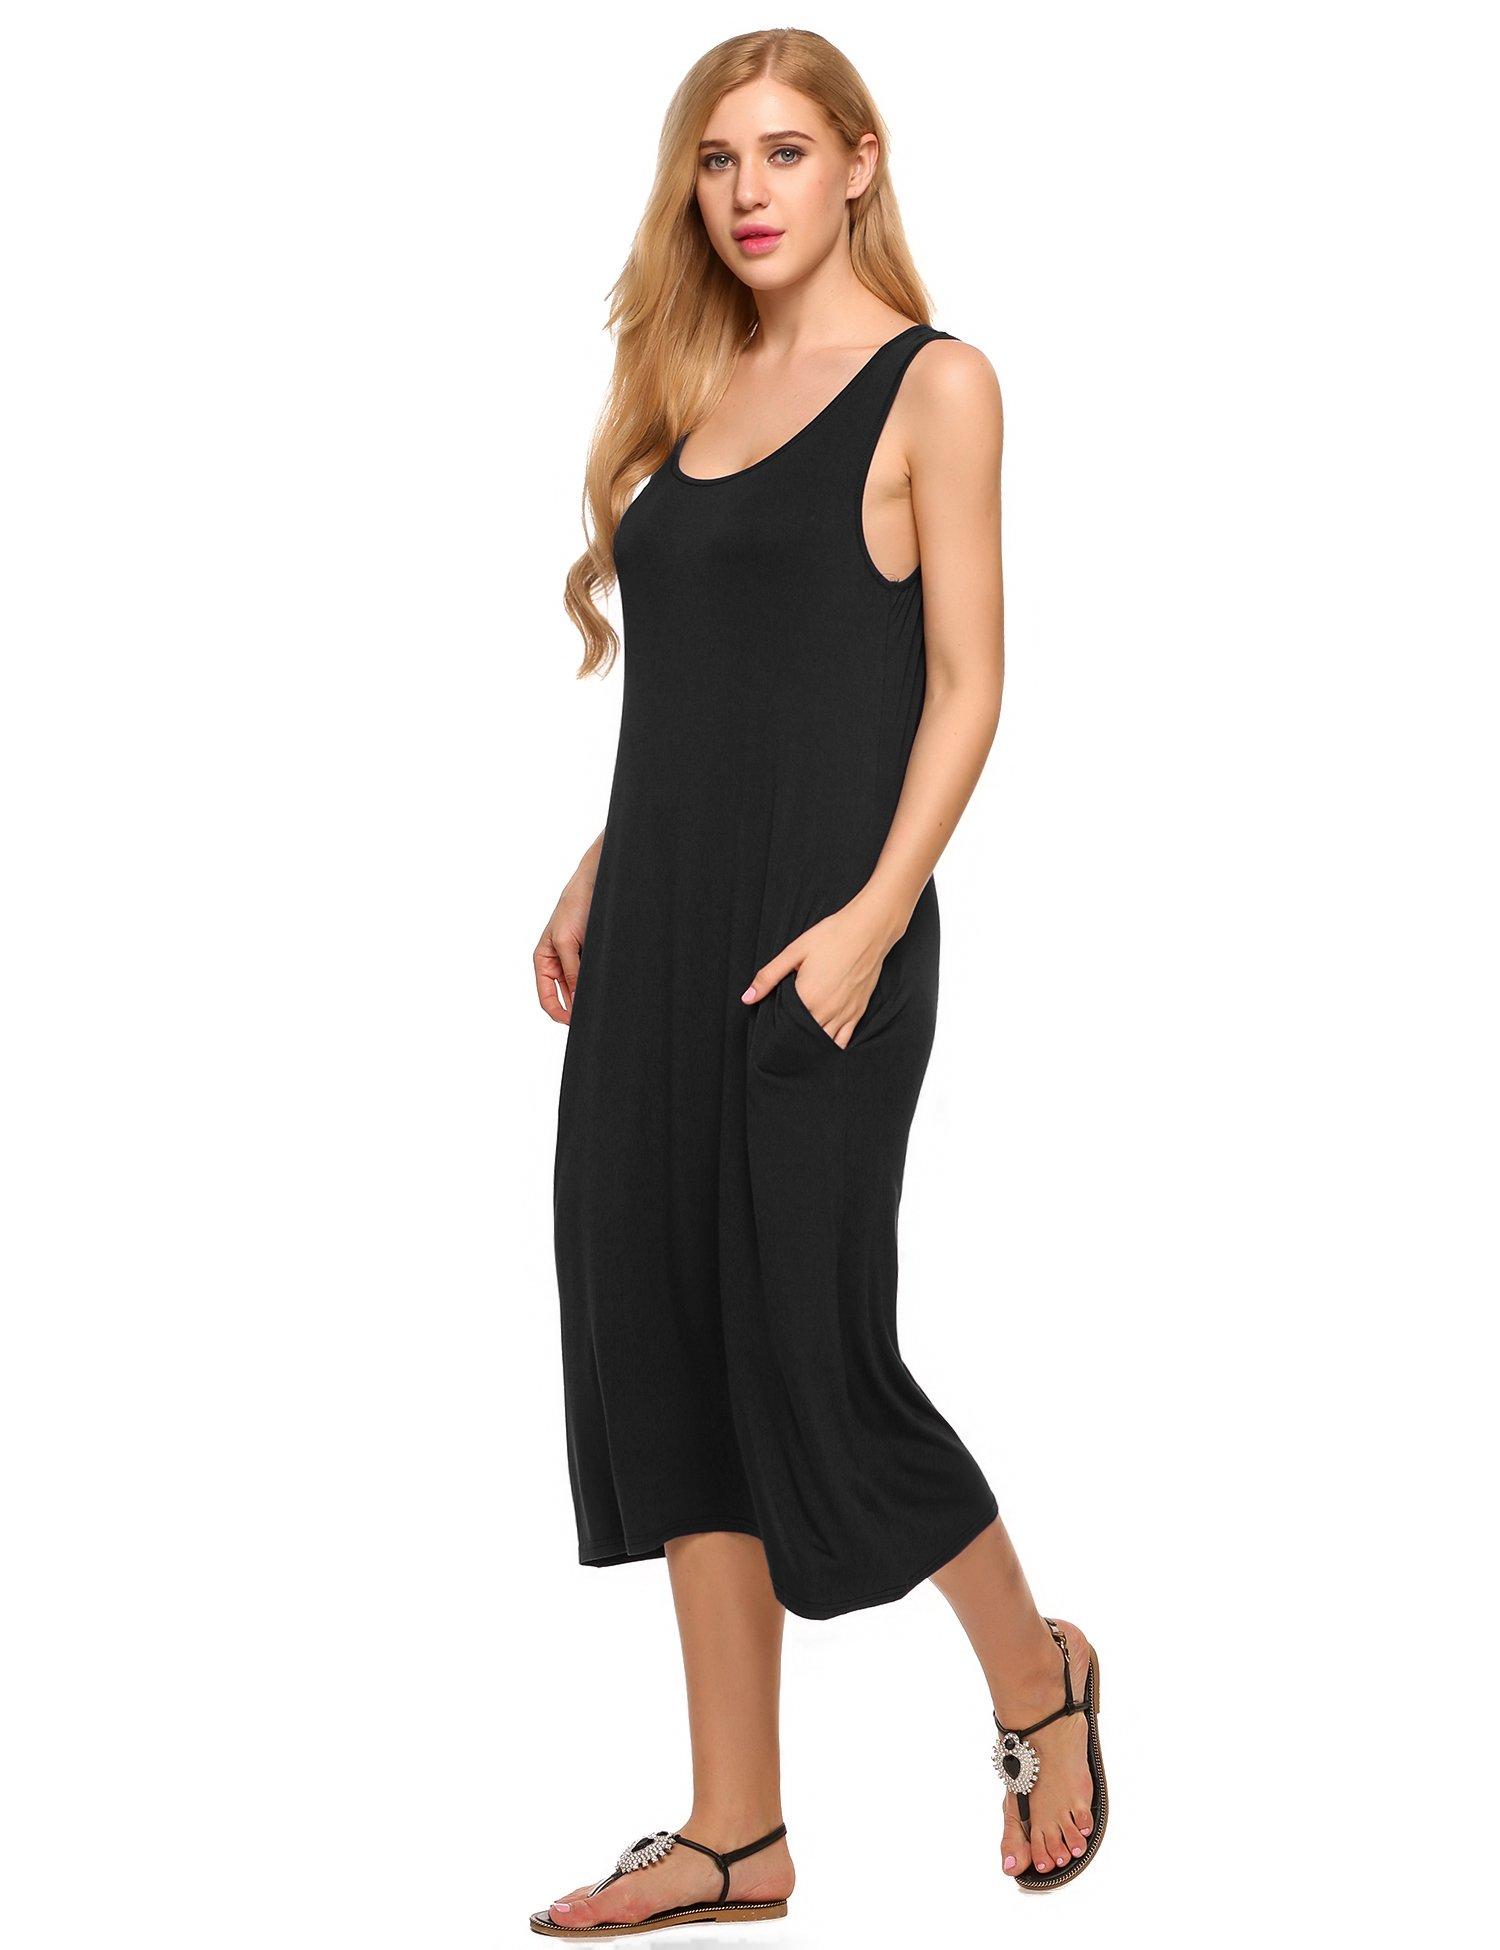 Wildtrest Women's Sleeveless Long Nightgown Scoop Neck Sleep Dress Casual Sleepwear with Pocket